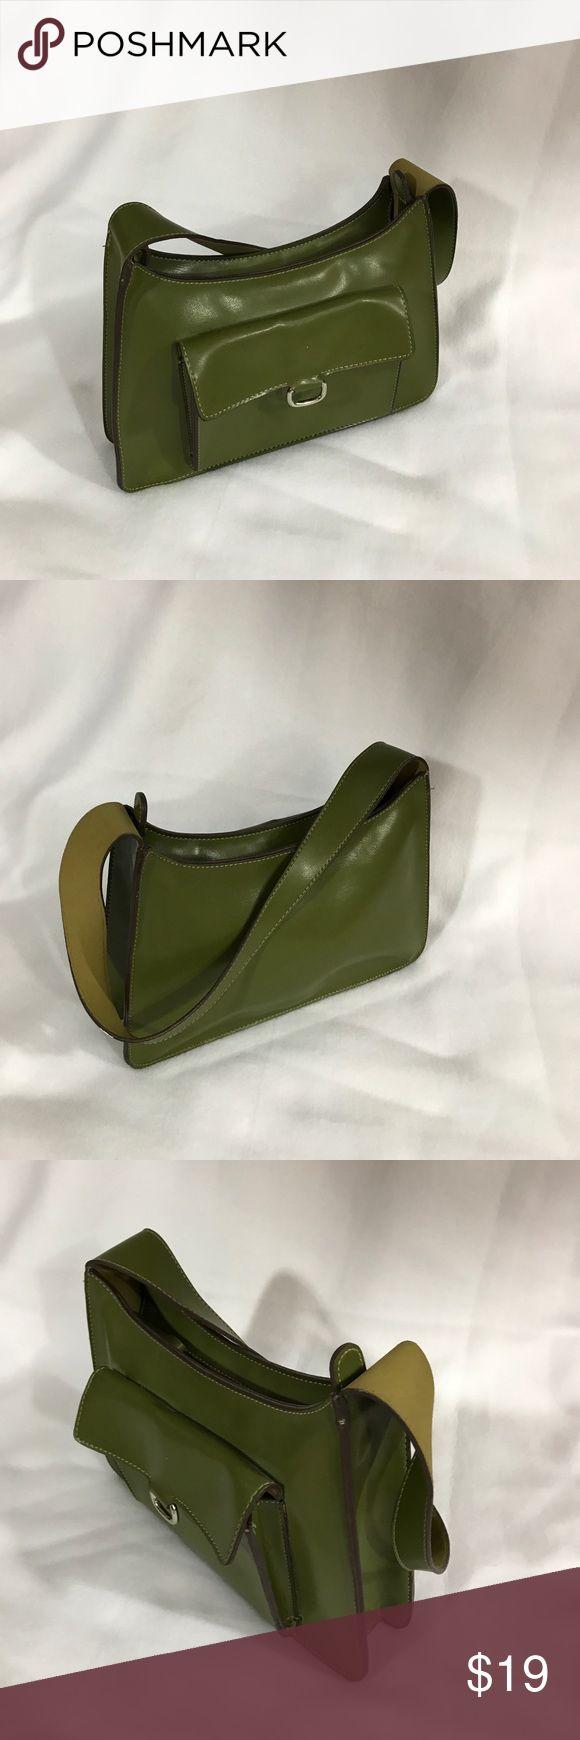 Mondani New York green shoulder bag Mondani New York green shoulder bag with zipper closure and pocket on the front.  In great used condition.  11 x 8 x 2 1/2.     (375) Mondani Bags Shoulder Bags